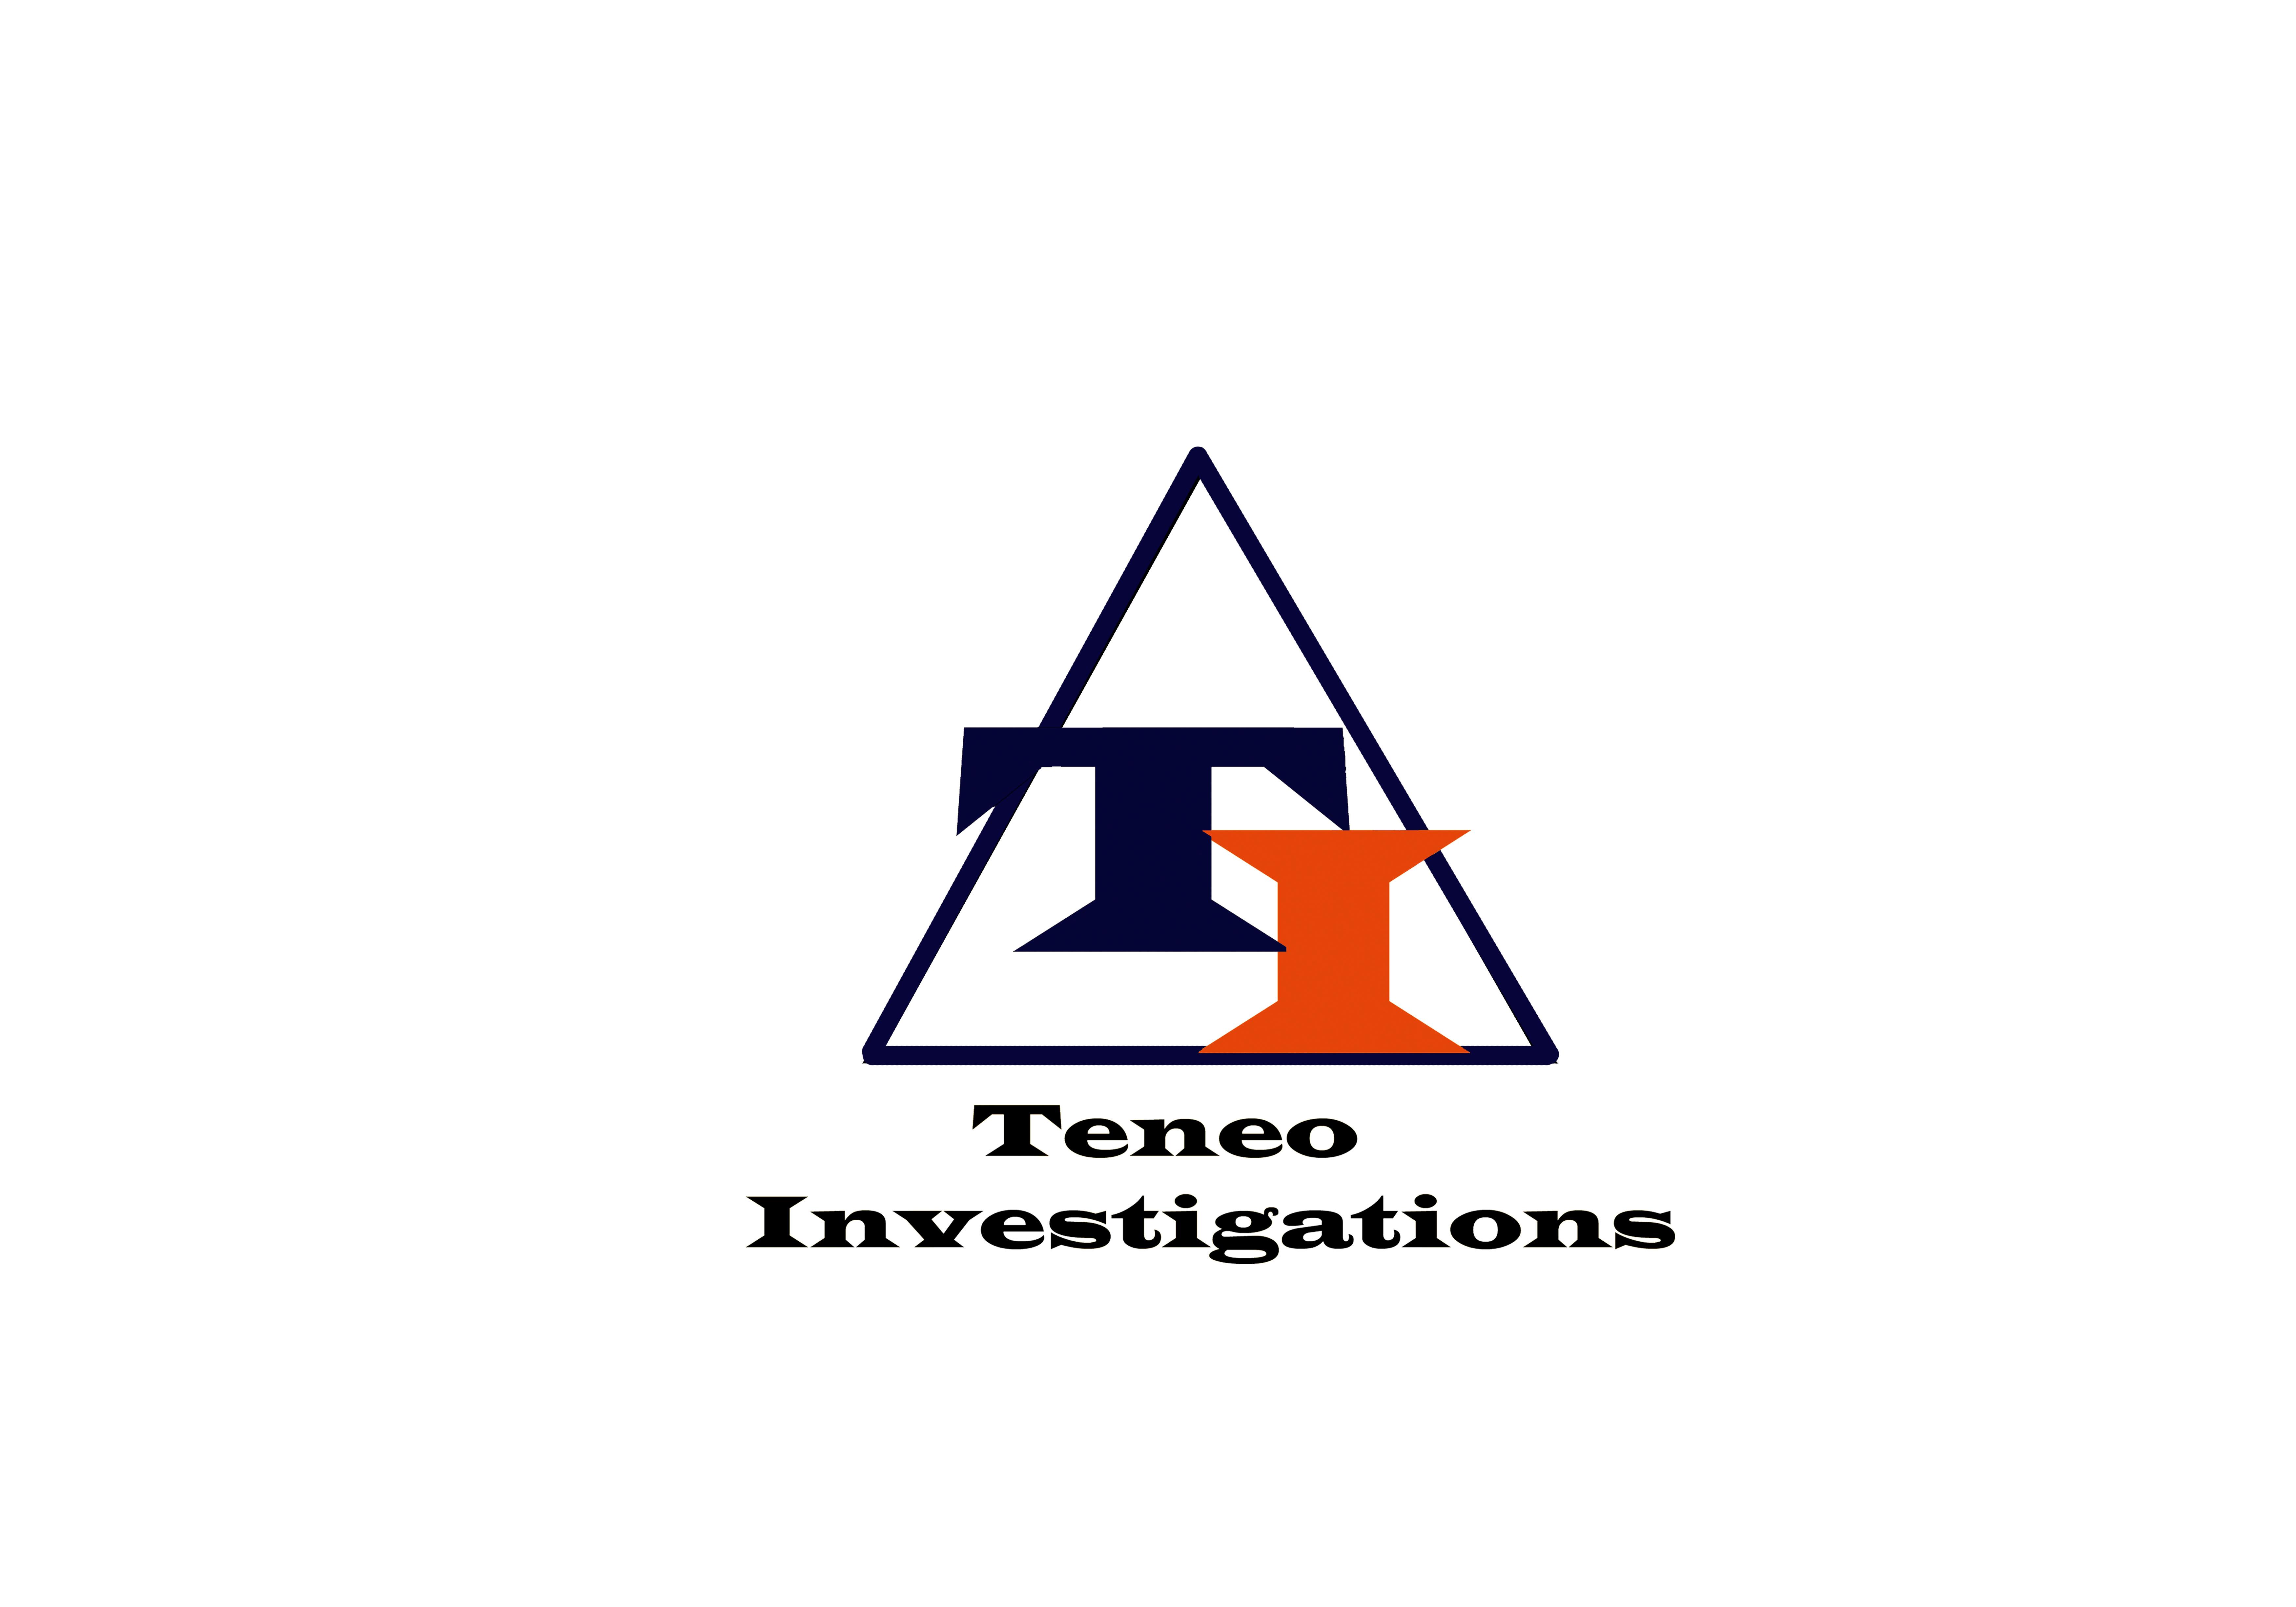 Teneo Investigations - ad image